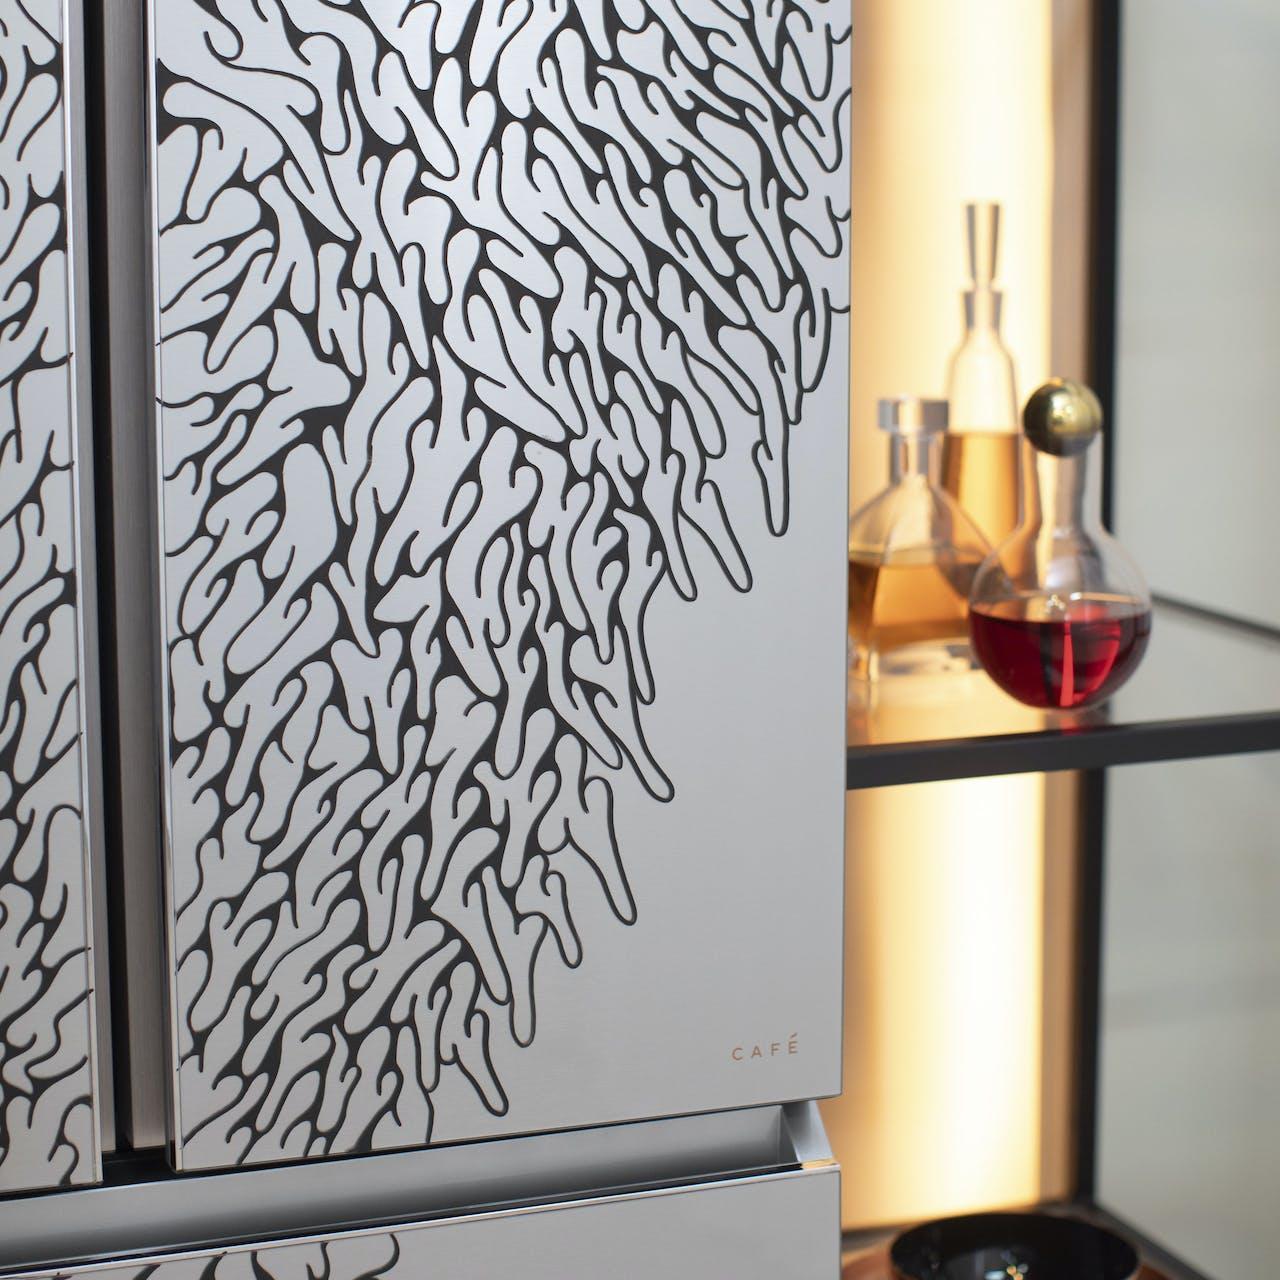 line art on modern glass refrigerator